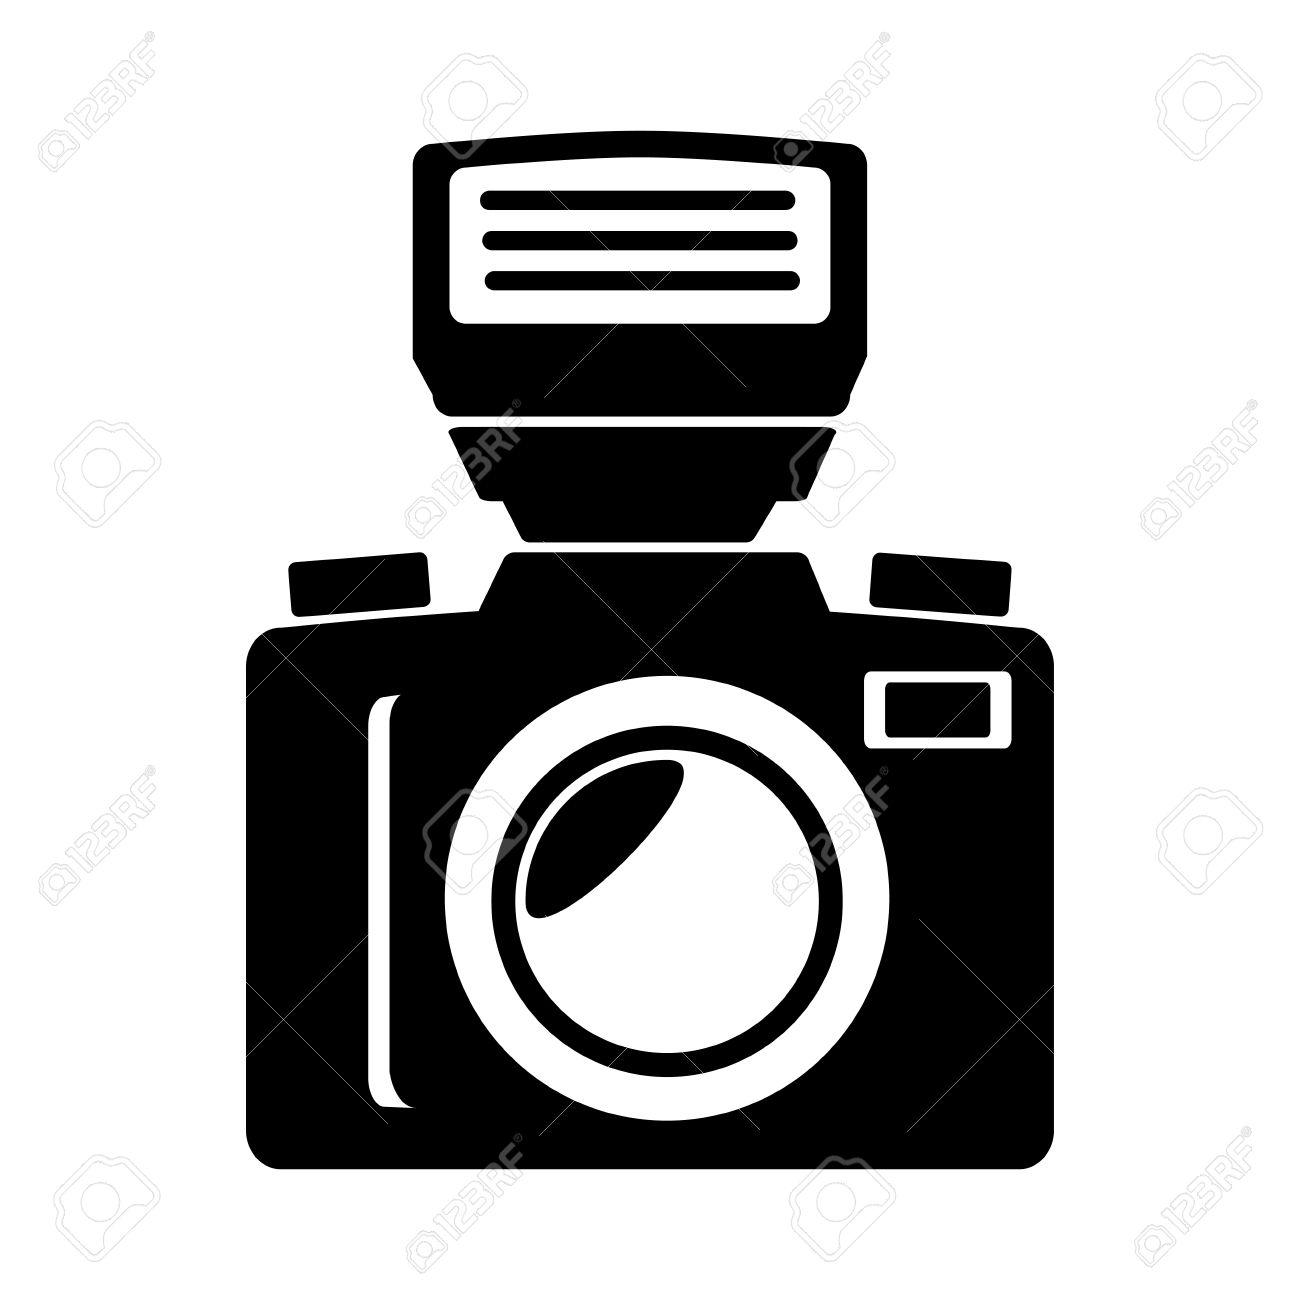 Vintage Photographic Camera Isolated Flat Icon Cartoon Royalty Free